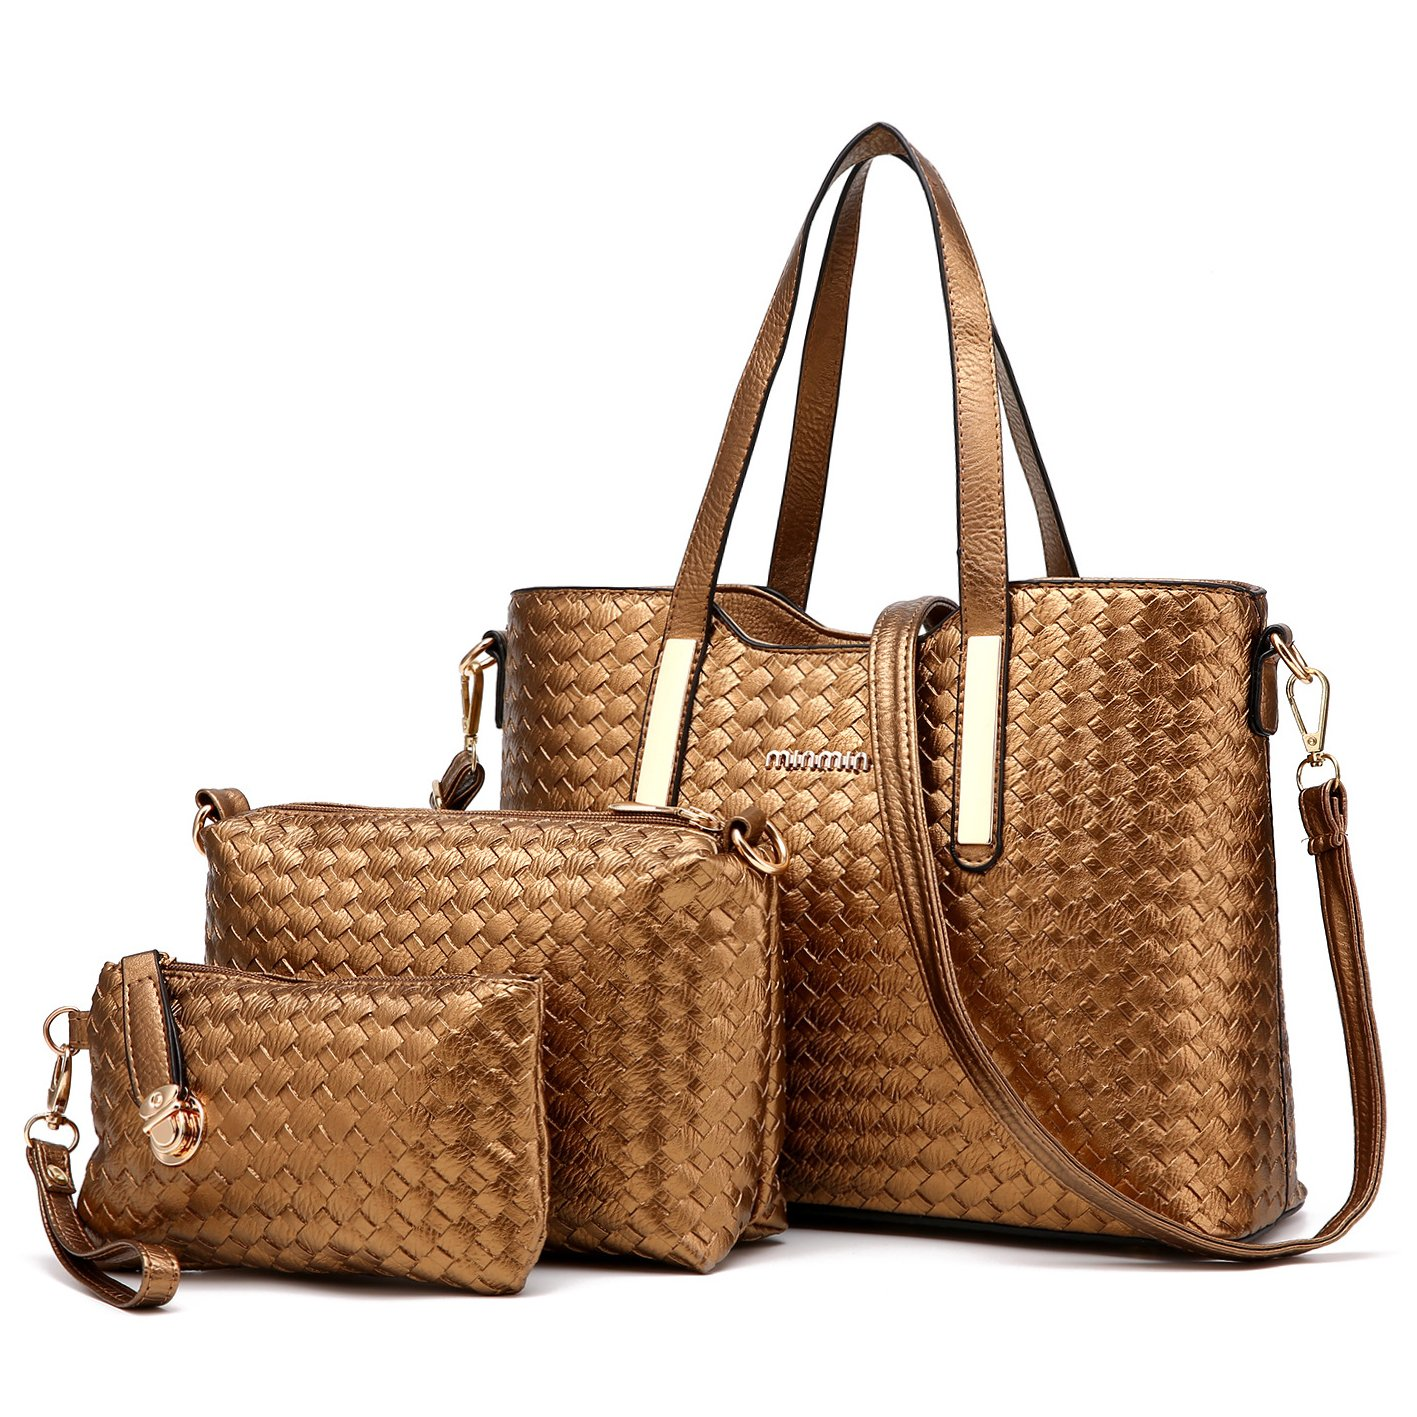 Tibes Fashion PU Leather Women Handbag+Shoulder Bag+Purse 3pcs Bag Weave Tote 111shoutibao22-mibaise